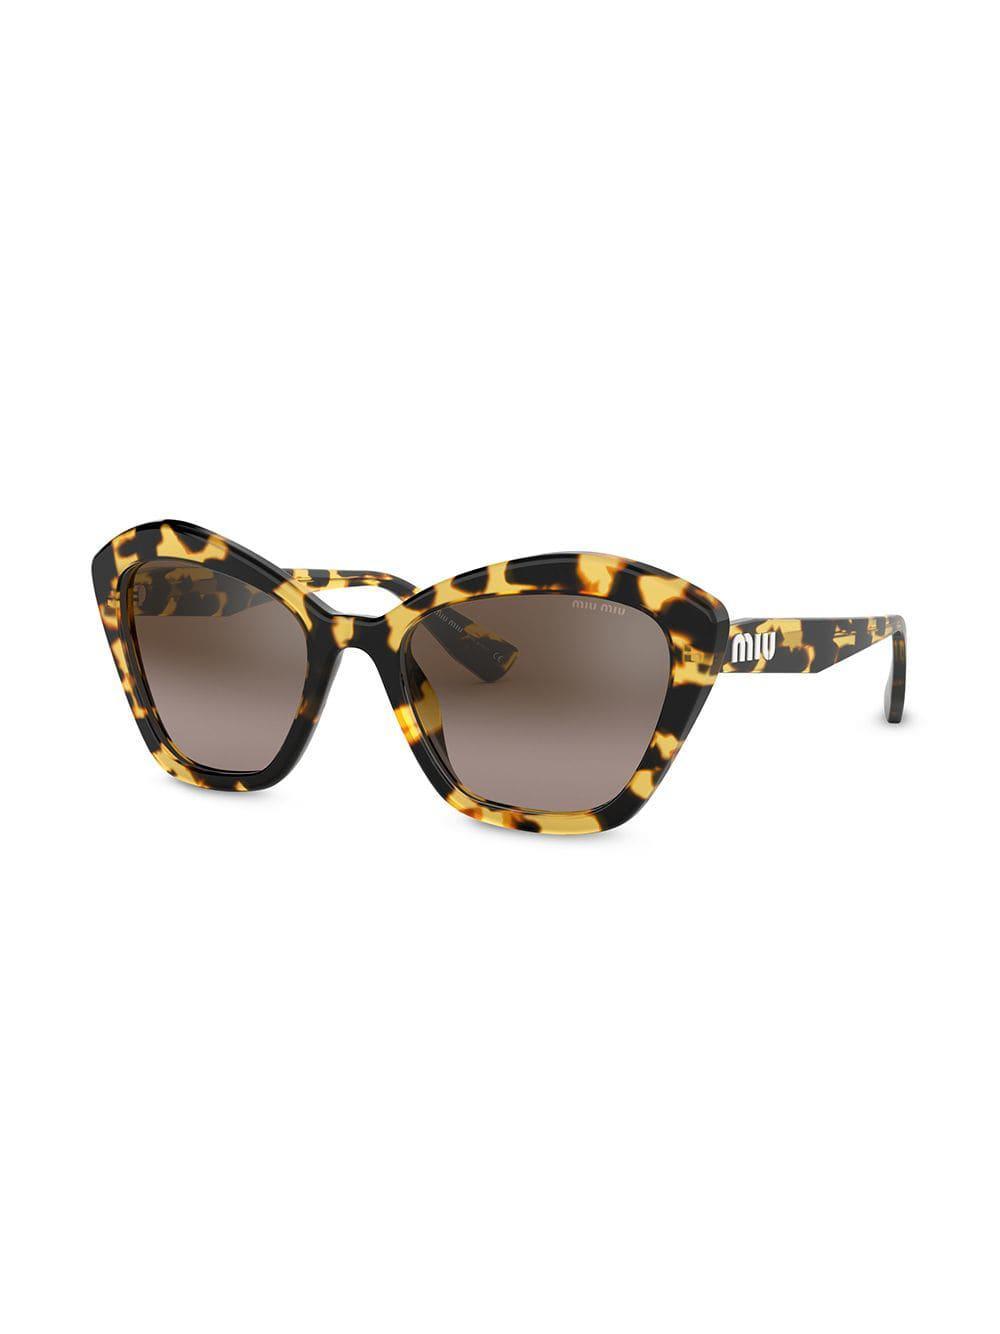 34f06f9d8c Miu Miu - Brown Oversized Cat-eye Sunglasses - Lyst. View fullscreen